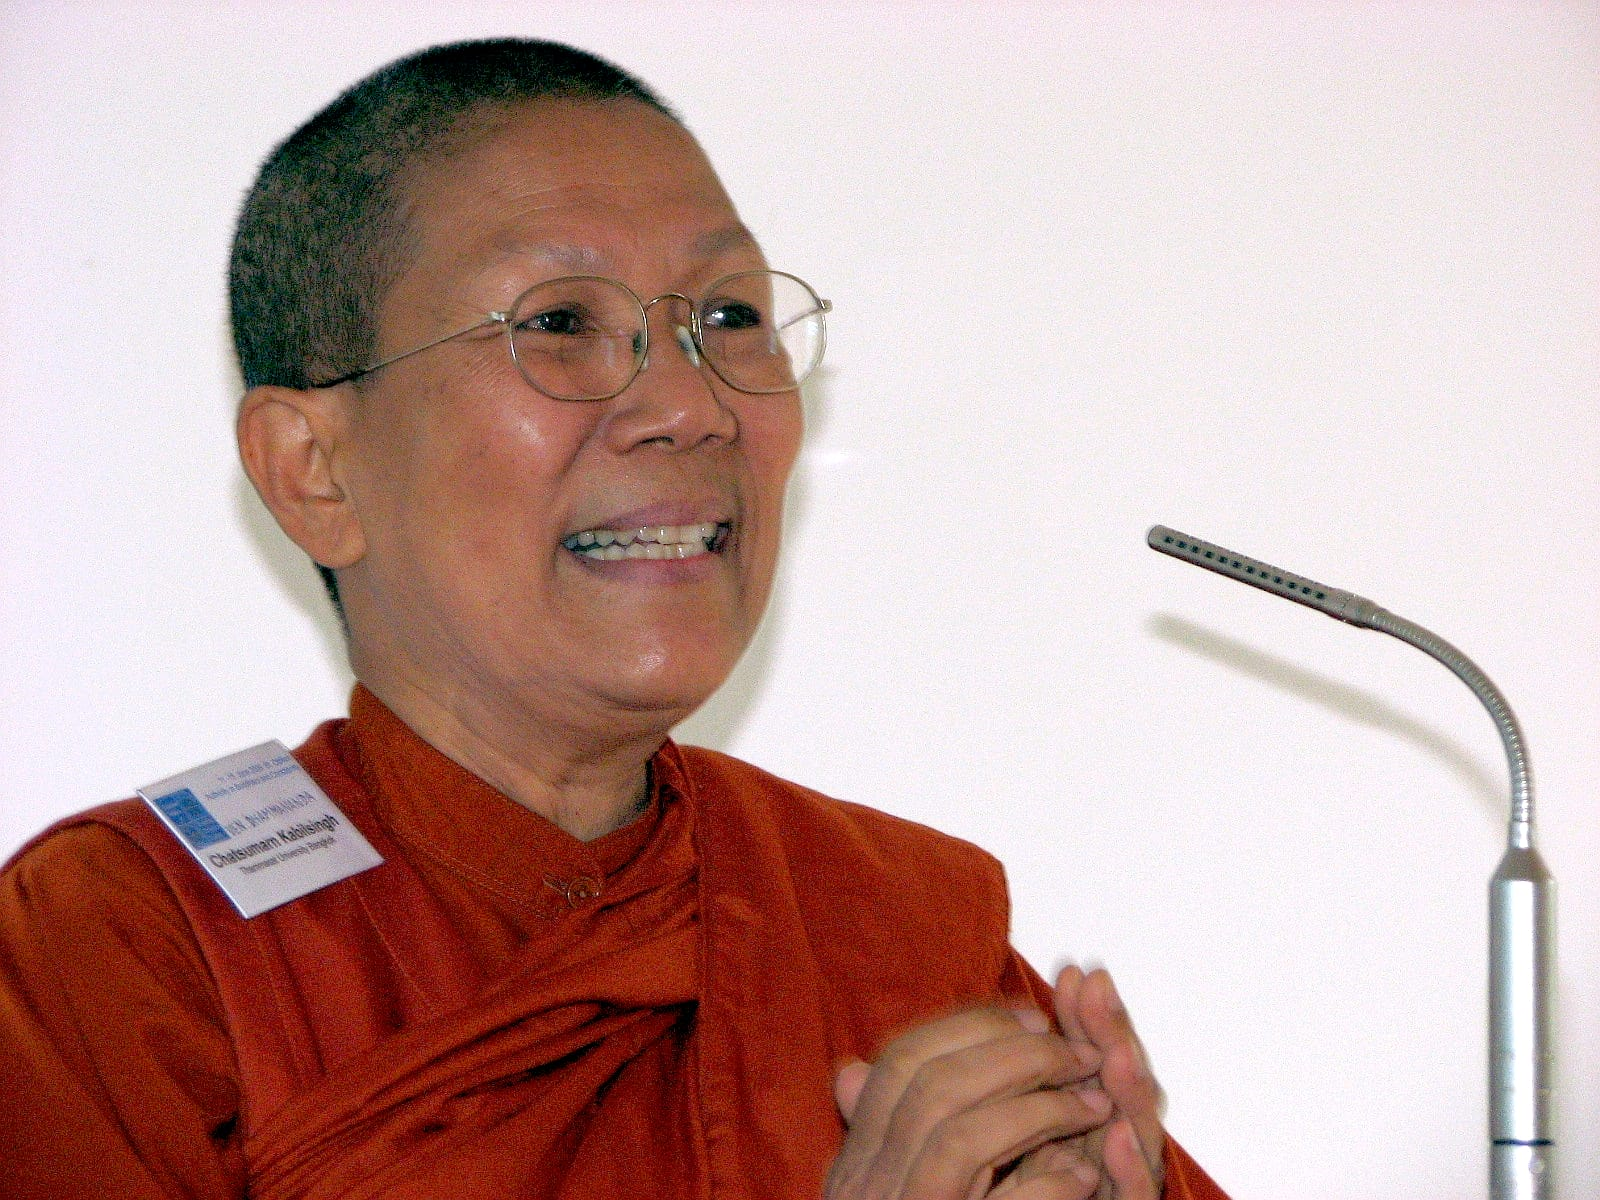 Venerable Dhammananda, Thai nuns, Thai Buddhism, nuns, ordination of nuns, ordination of women, Buddhist nuns, bhikkhuni